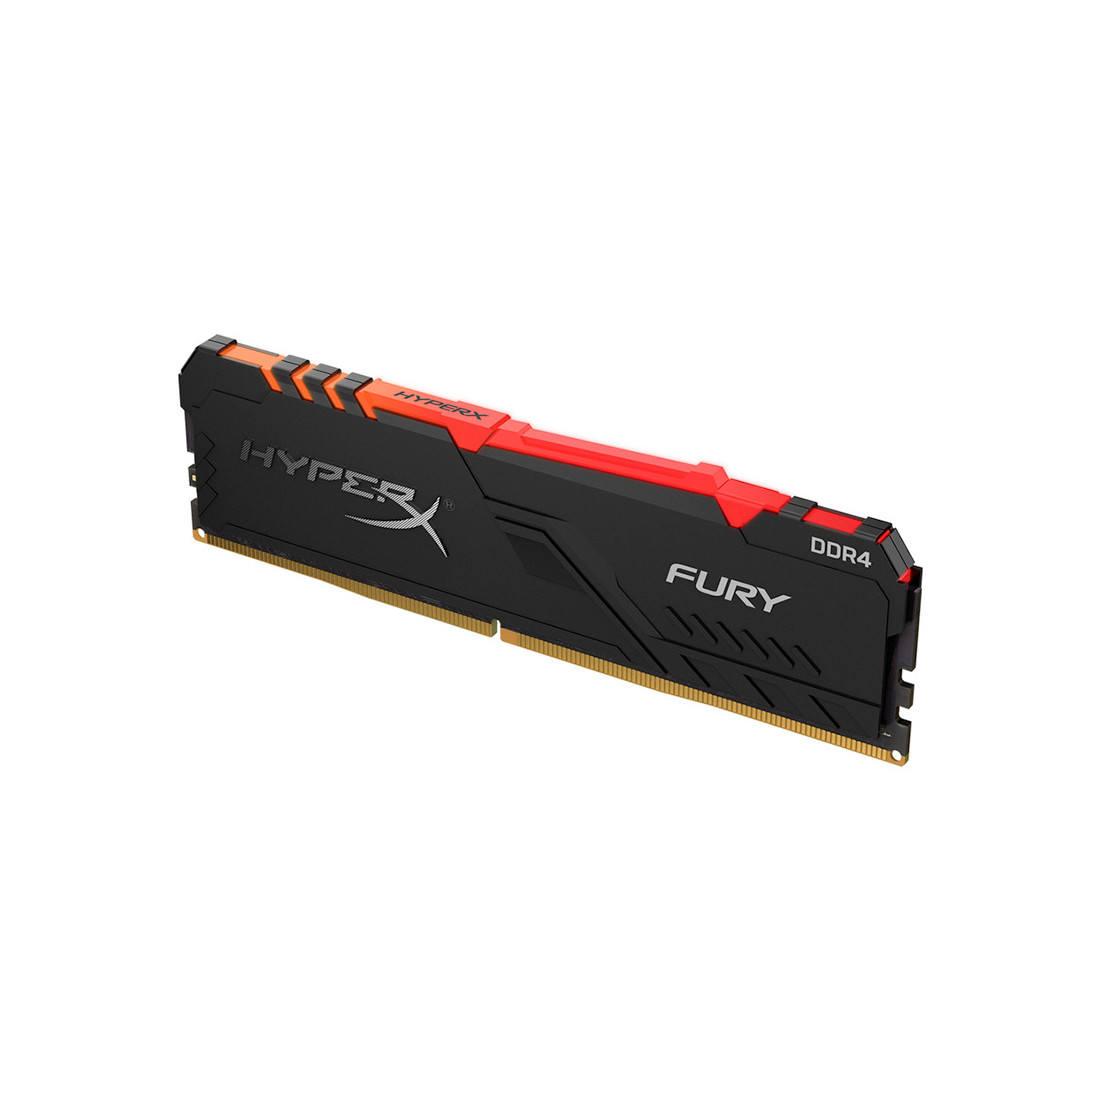 Модуль памяти Kingston HyperX Fury RGB HX426C16FB3A/8 DDR4 8GB DIMM  Чёрный